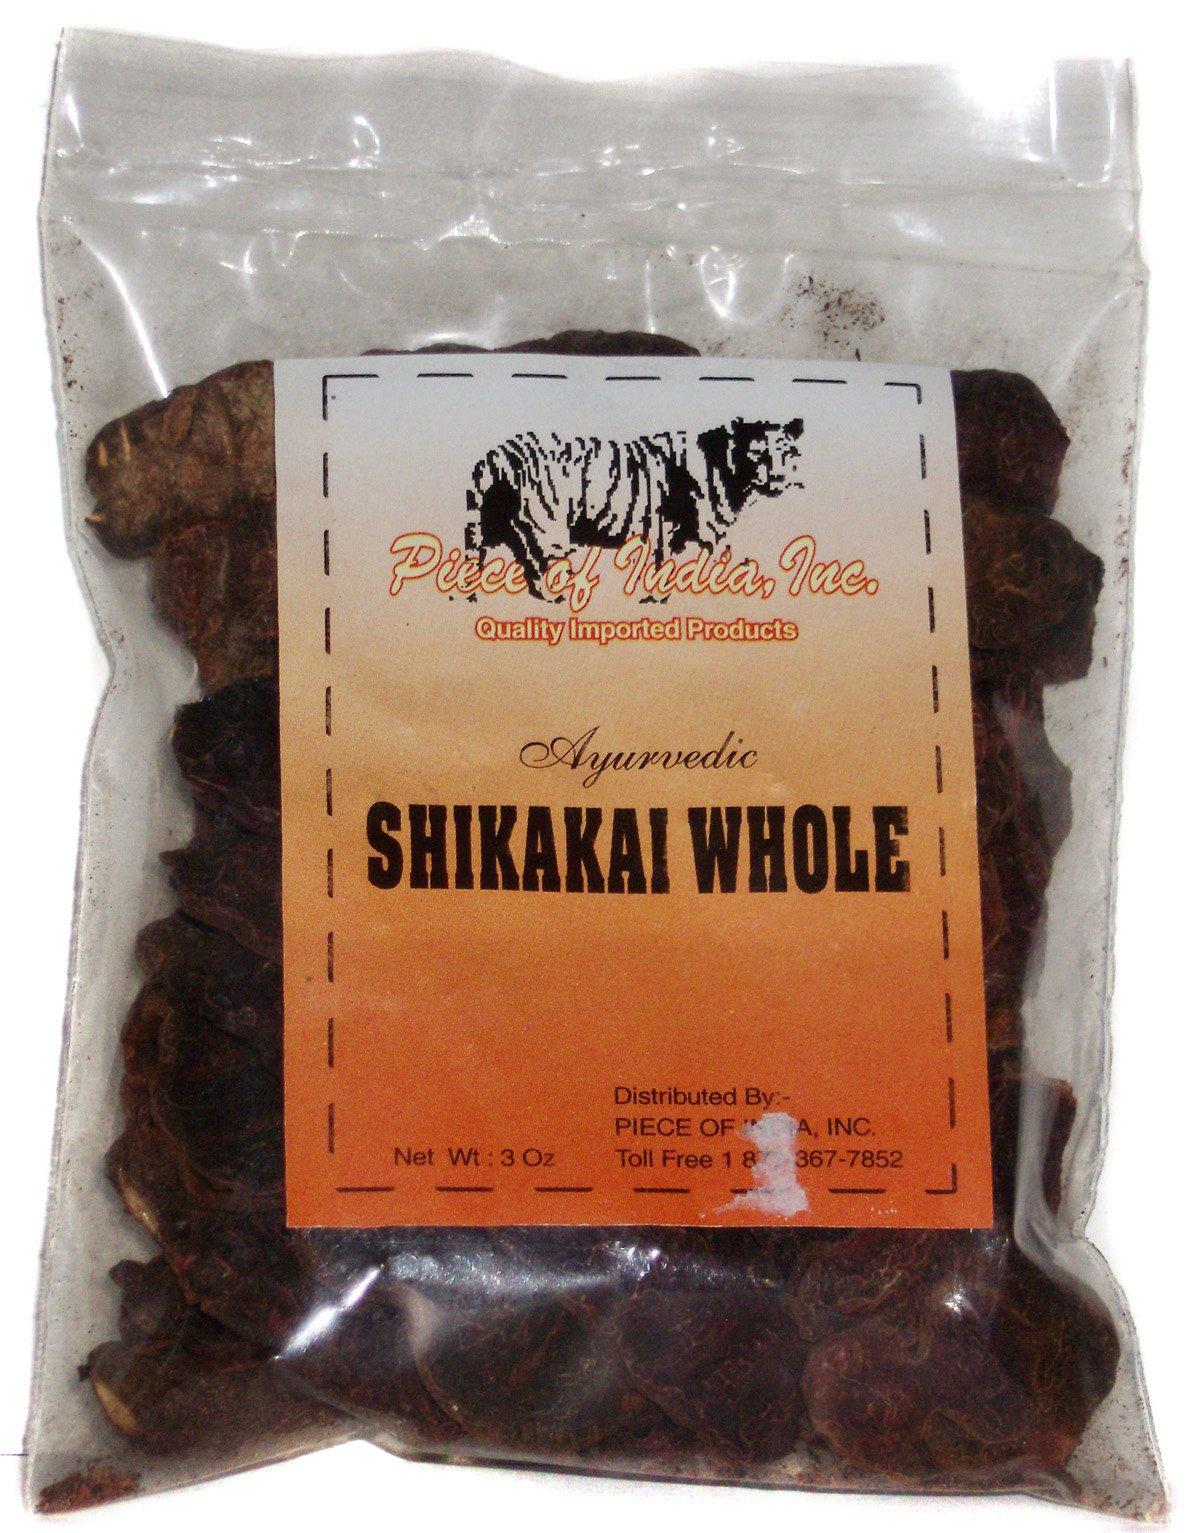 Shikakai Whole - 2.5oz